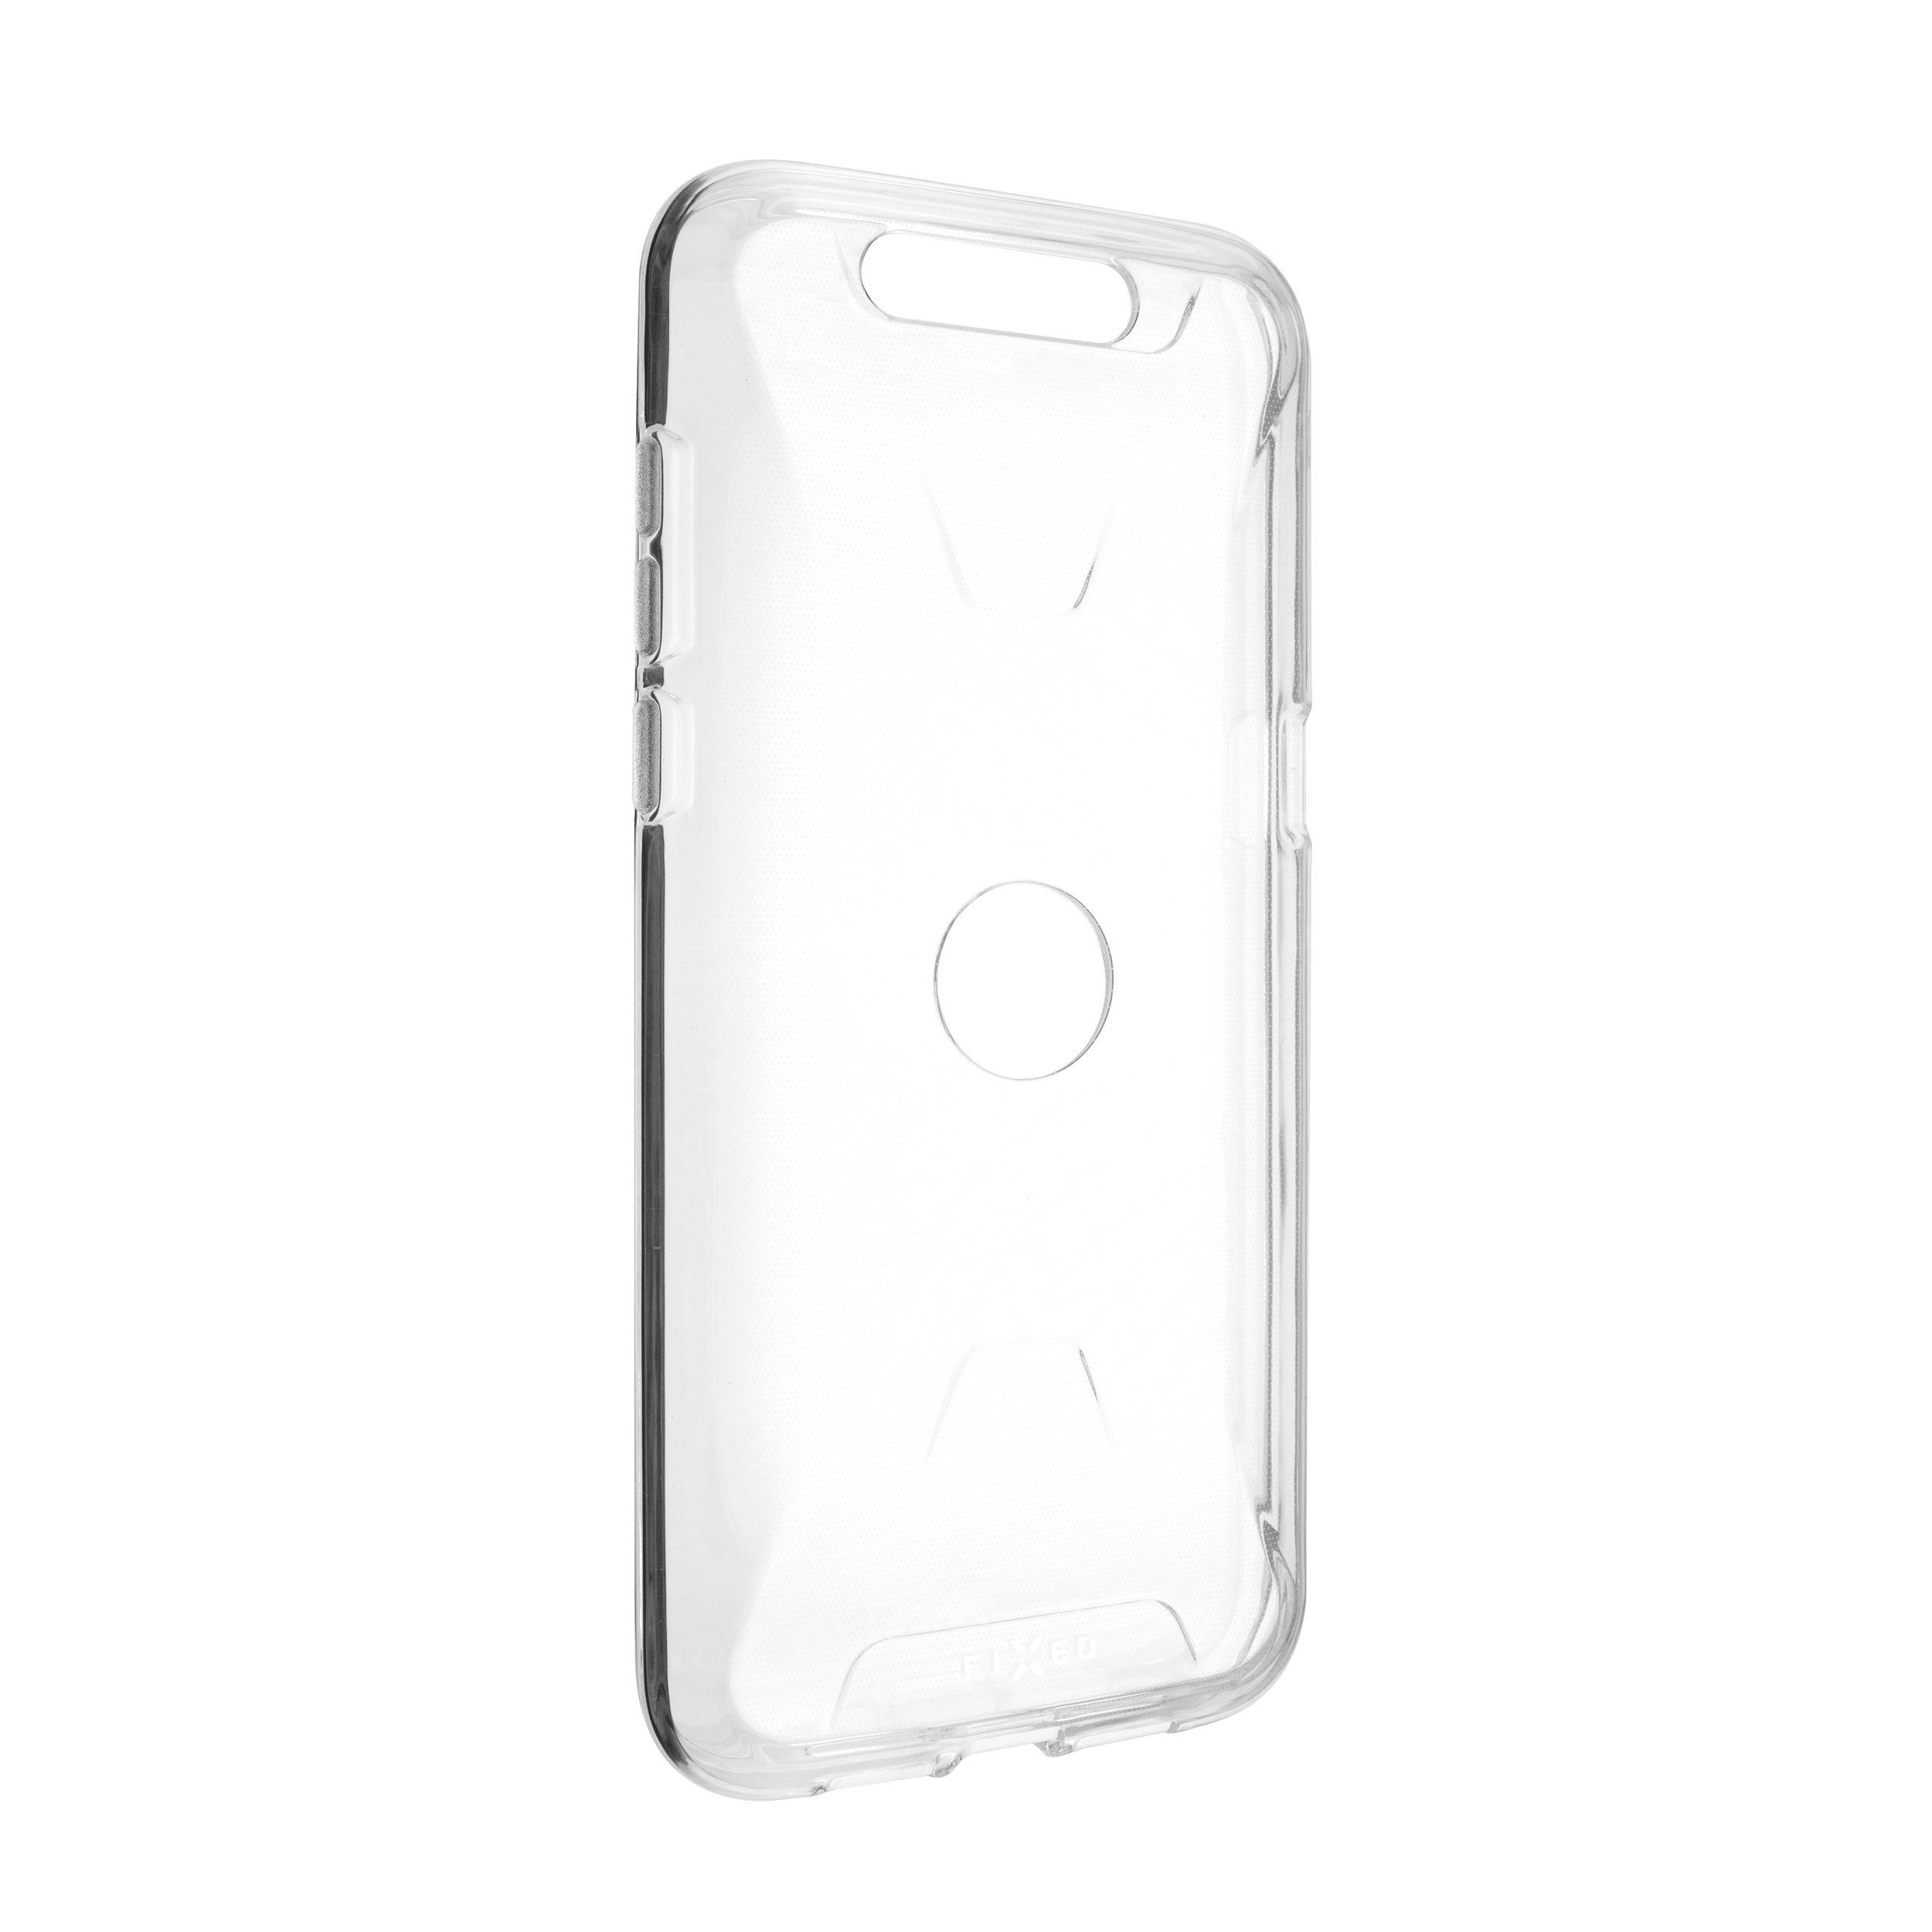 TPU gelové pouzdro FIXED pro Xiaomi Black Shark, čiré